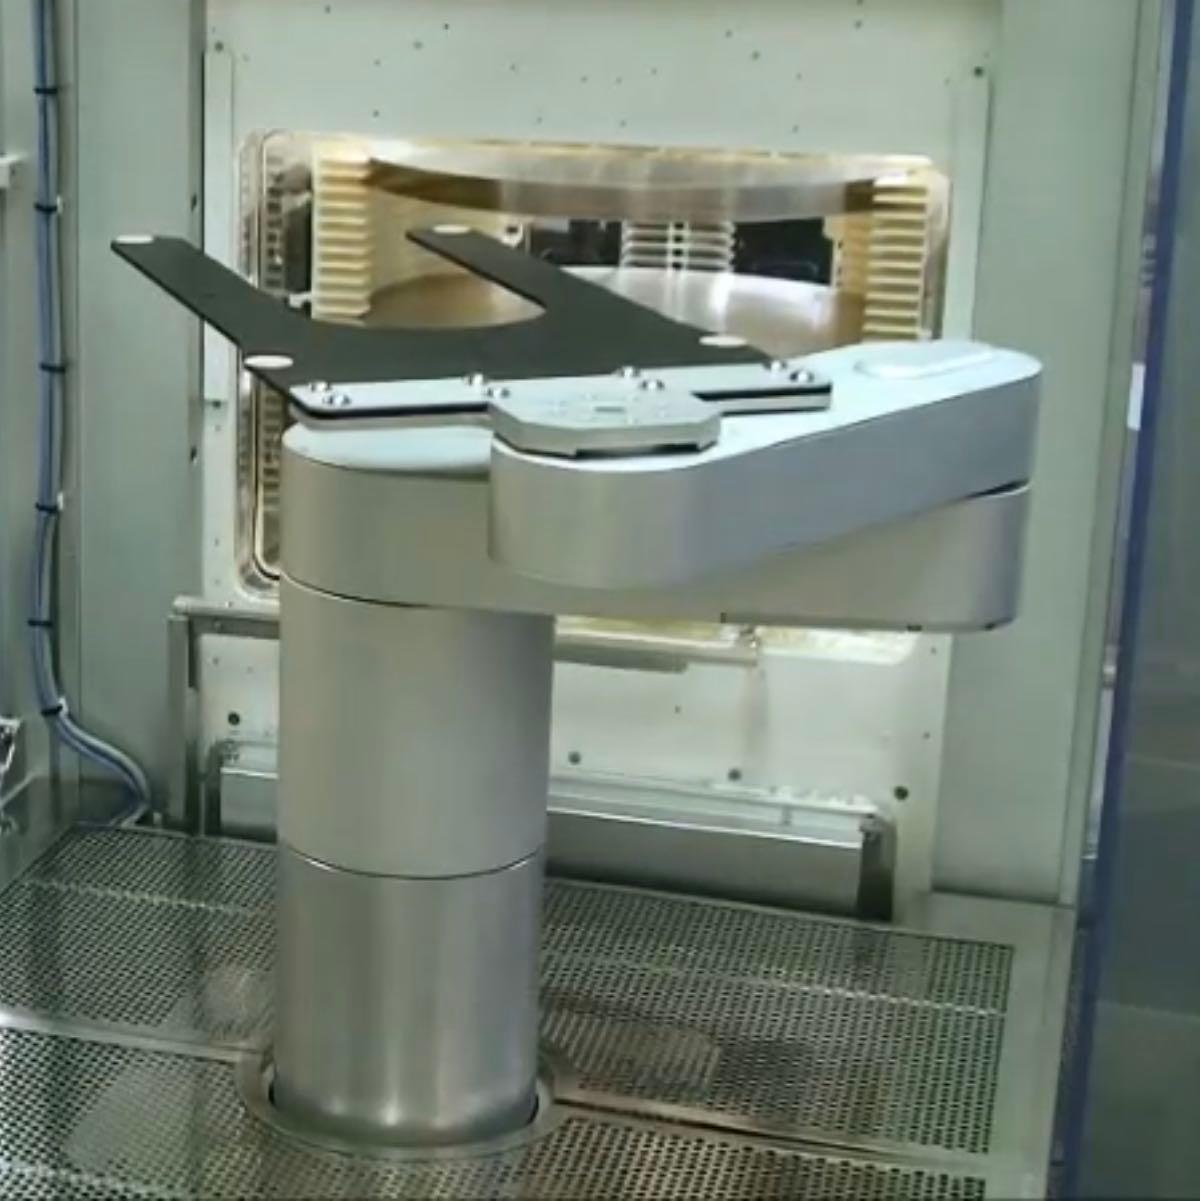 PHT菲科硅晶圆搬运机器人